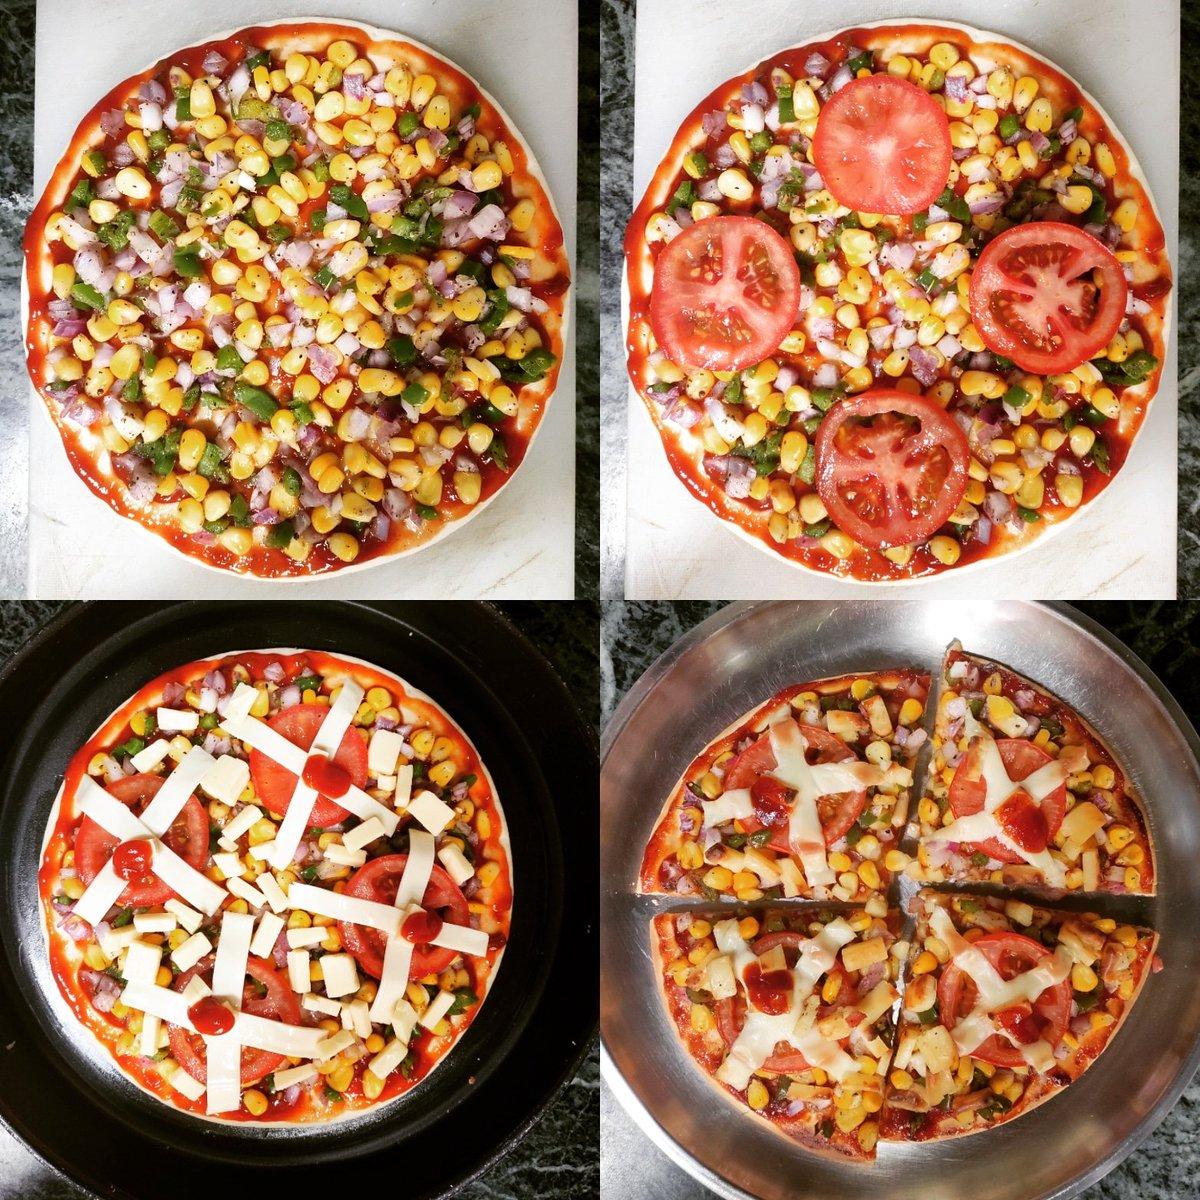 Aaj Sunday Lockdown Pizza is ready! 1.2.3.4! 🍕🍅🌽🌶️🍴😋  #weekend #sunday #brunch #india #coronavirus #lockdown #foodie #foodiesofindia #foodgasm #lunchtime #foodiesofinstagram #foodaholic  #vegetarian #cooking #sundaychef #cheflife🔪 #homemade #IndiaFightsCornona